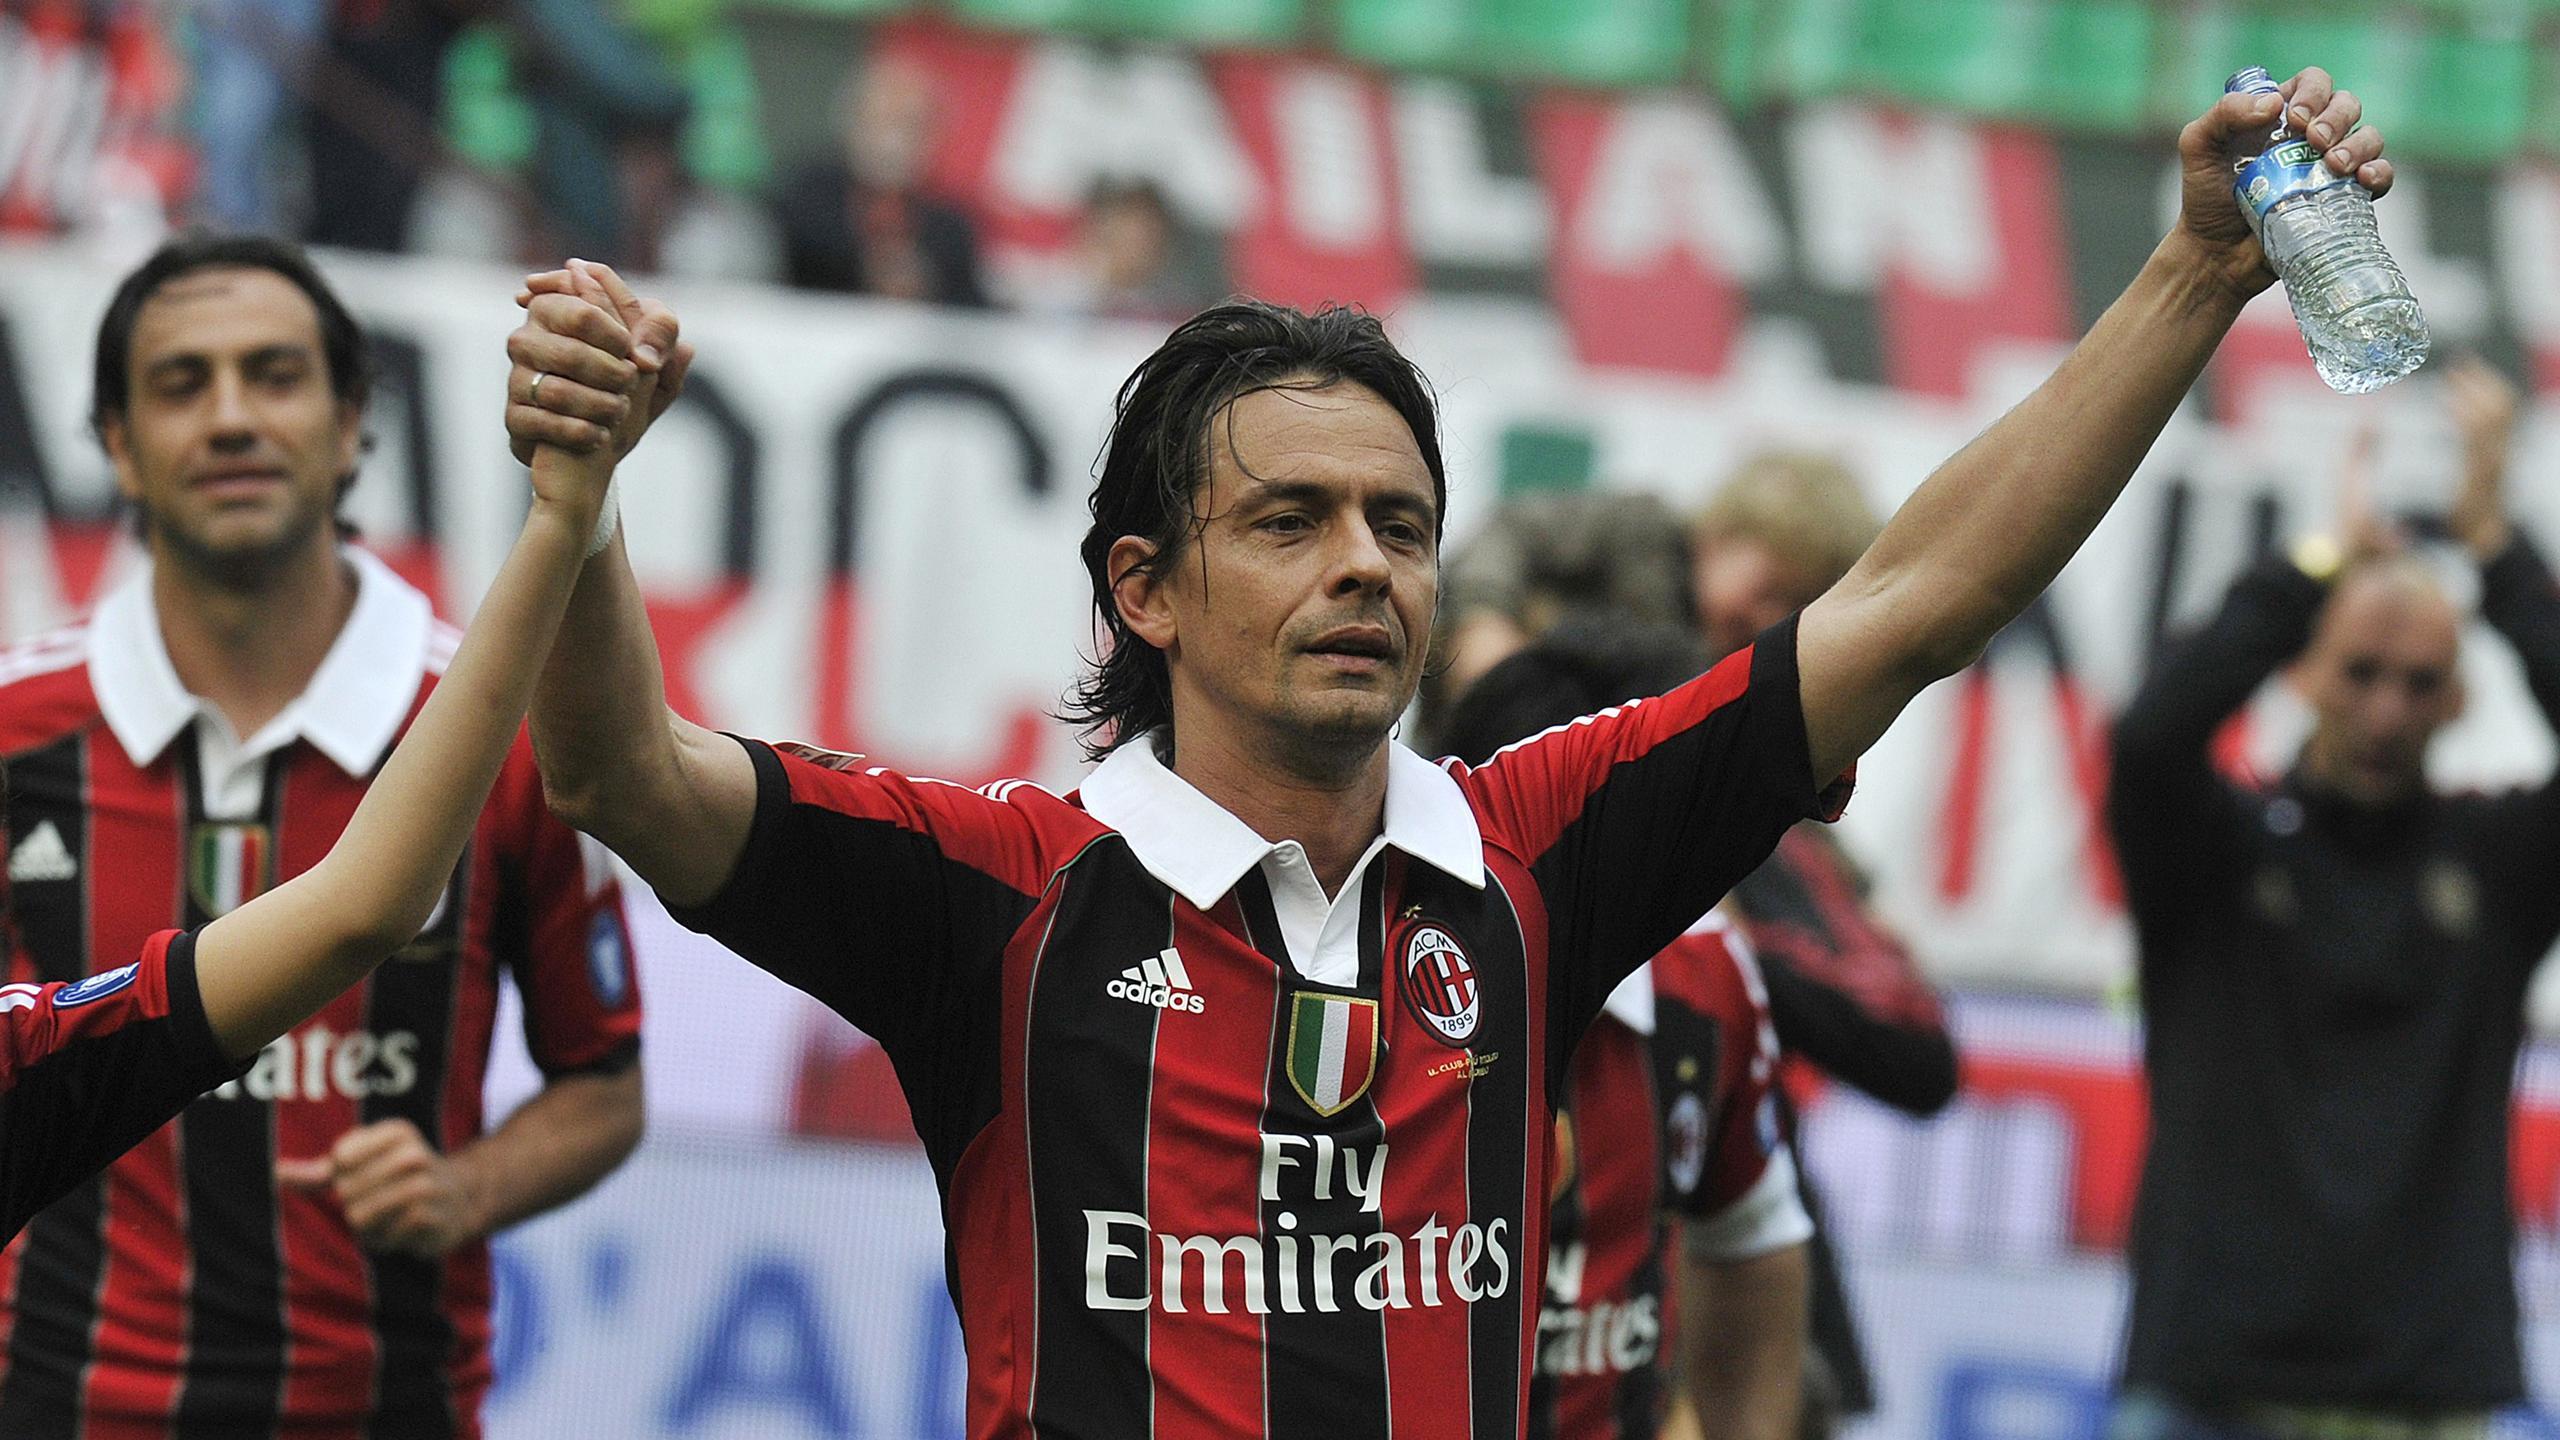 FACTBOX-New AC Milan coach Filippo Inzaghi - Serie A 2013 ...